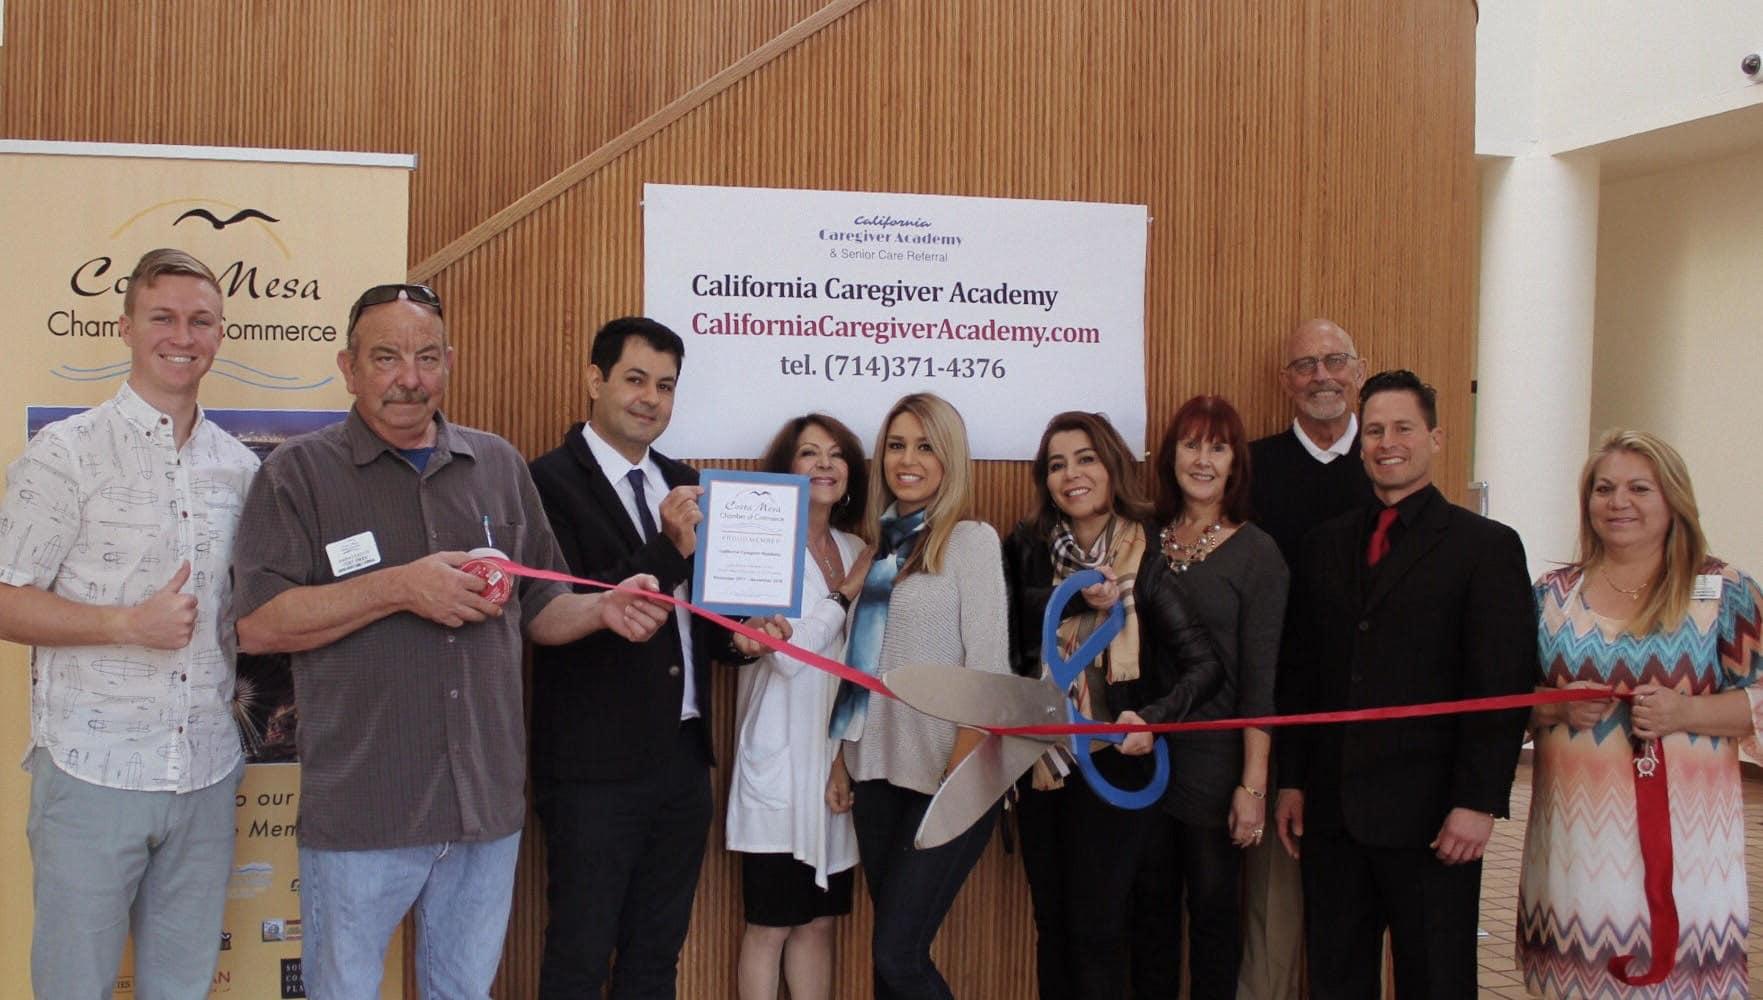 CA-Caregiver-ribbon-uncrop-w1763.jpg